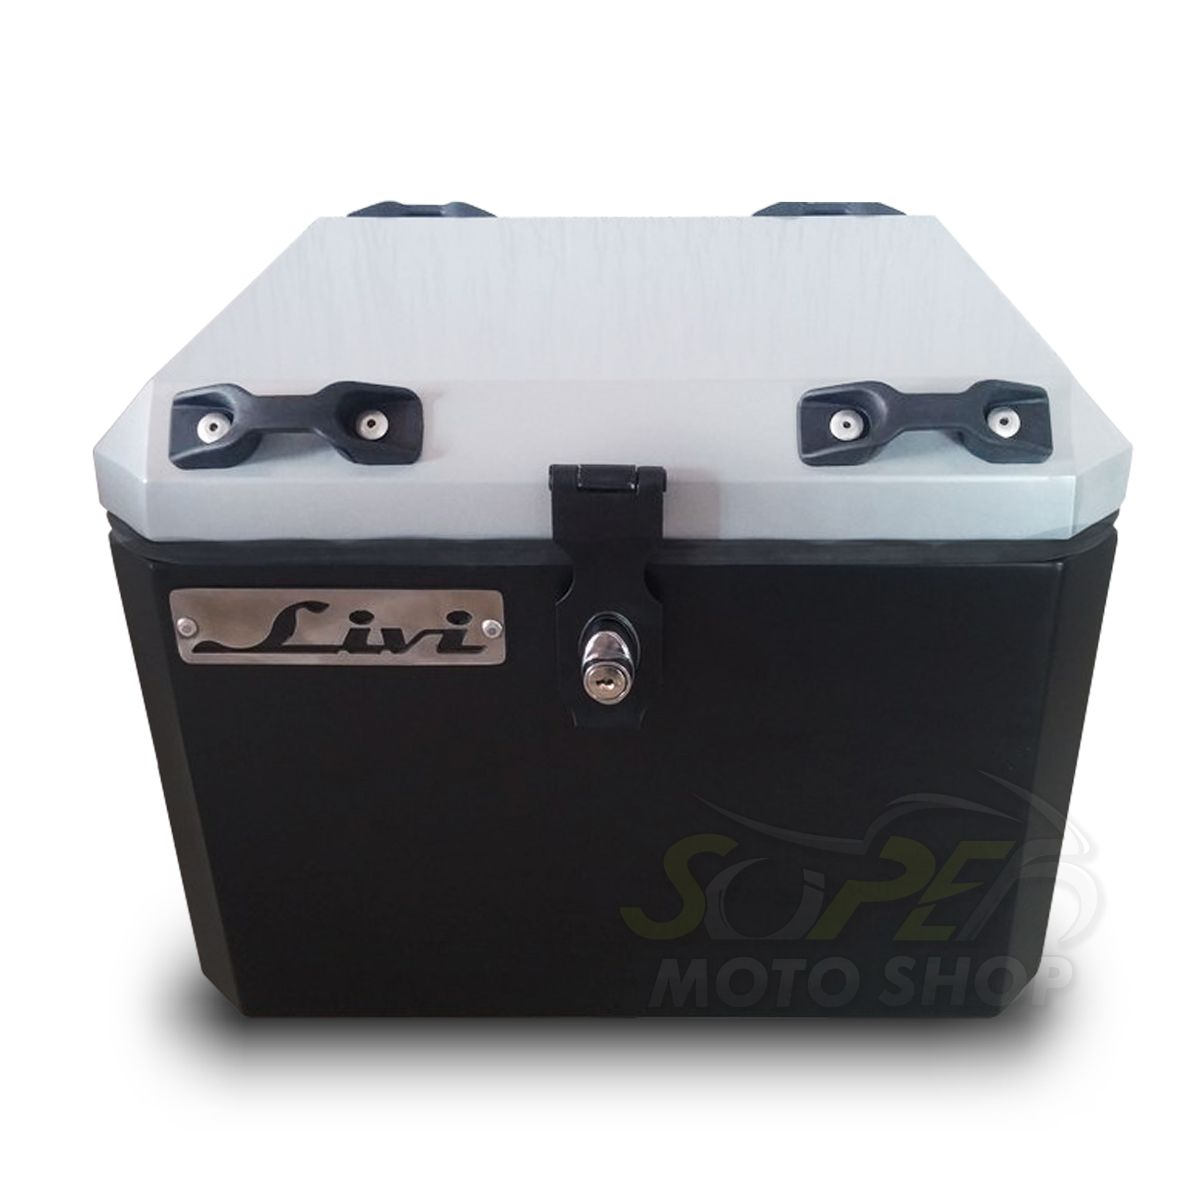 Bauleto / Baú Traseiro / Top Case Modelo Livi + Suporte Base - G 310 GS - BMW